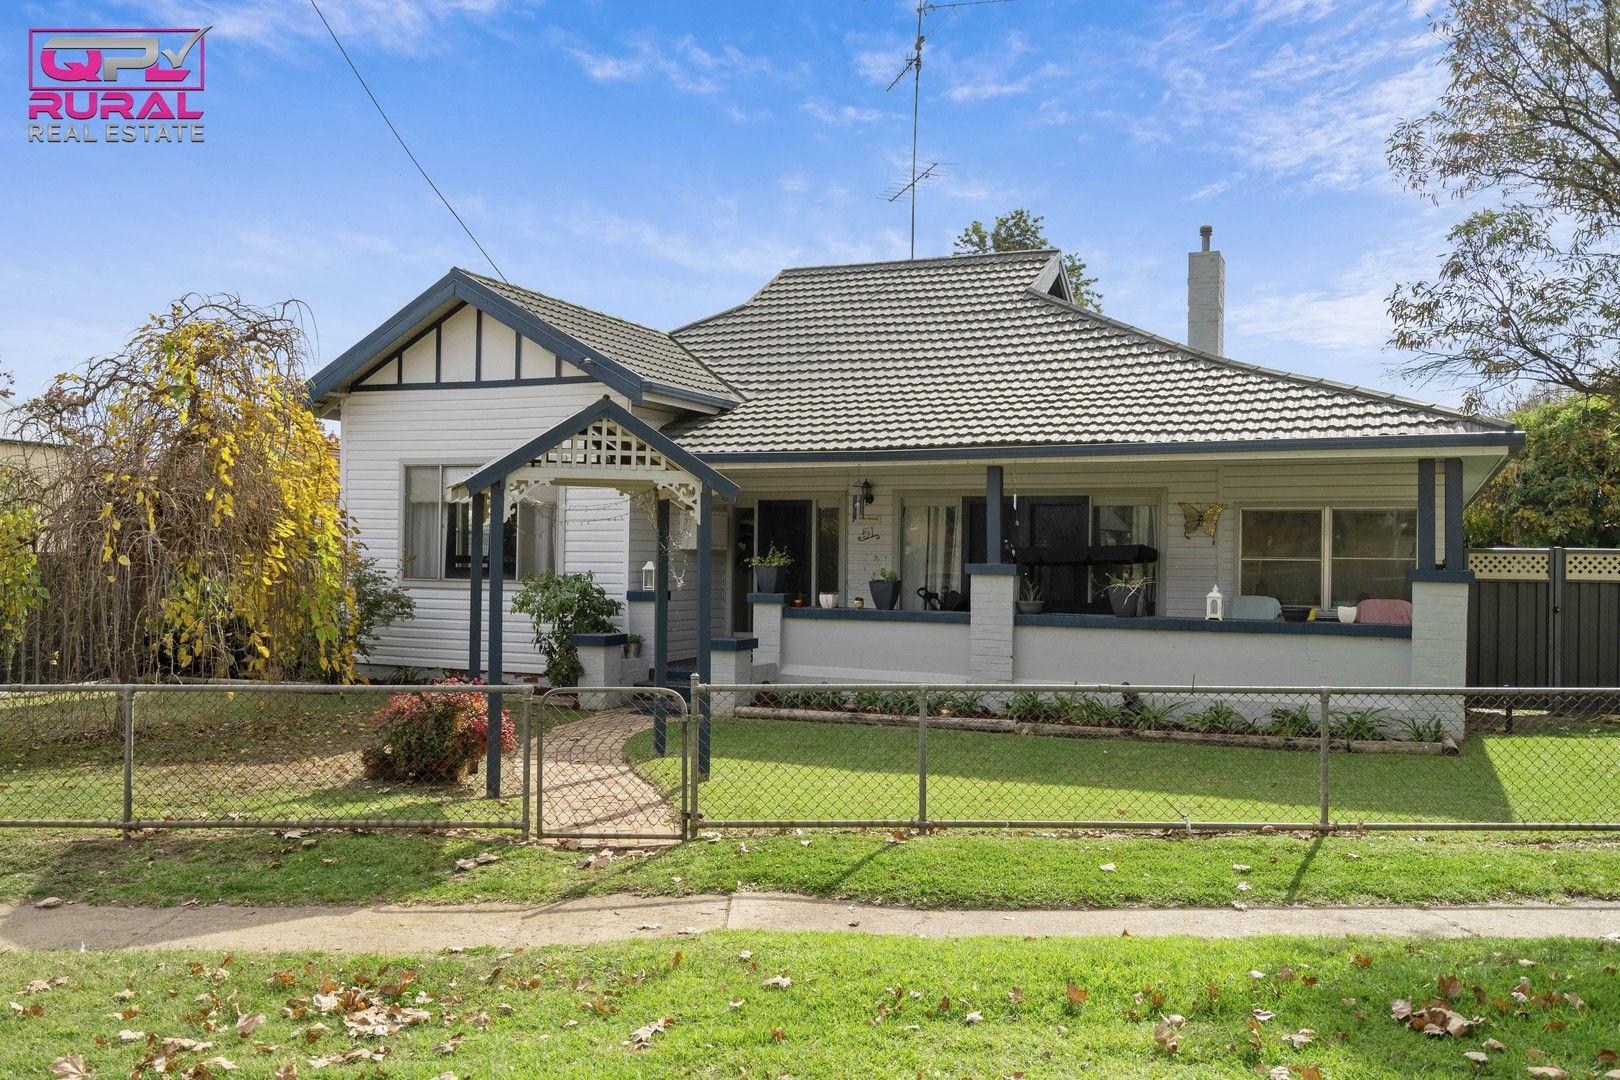 51 - 53 Victoria Avenue, Narrandera NSW 2700, Image 0